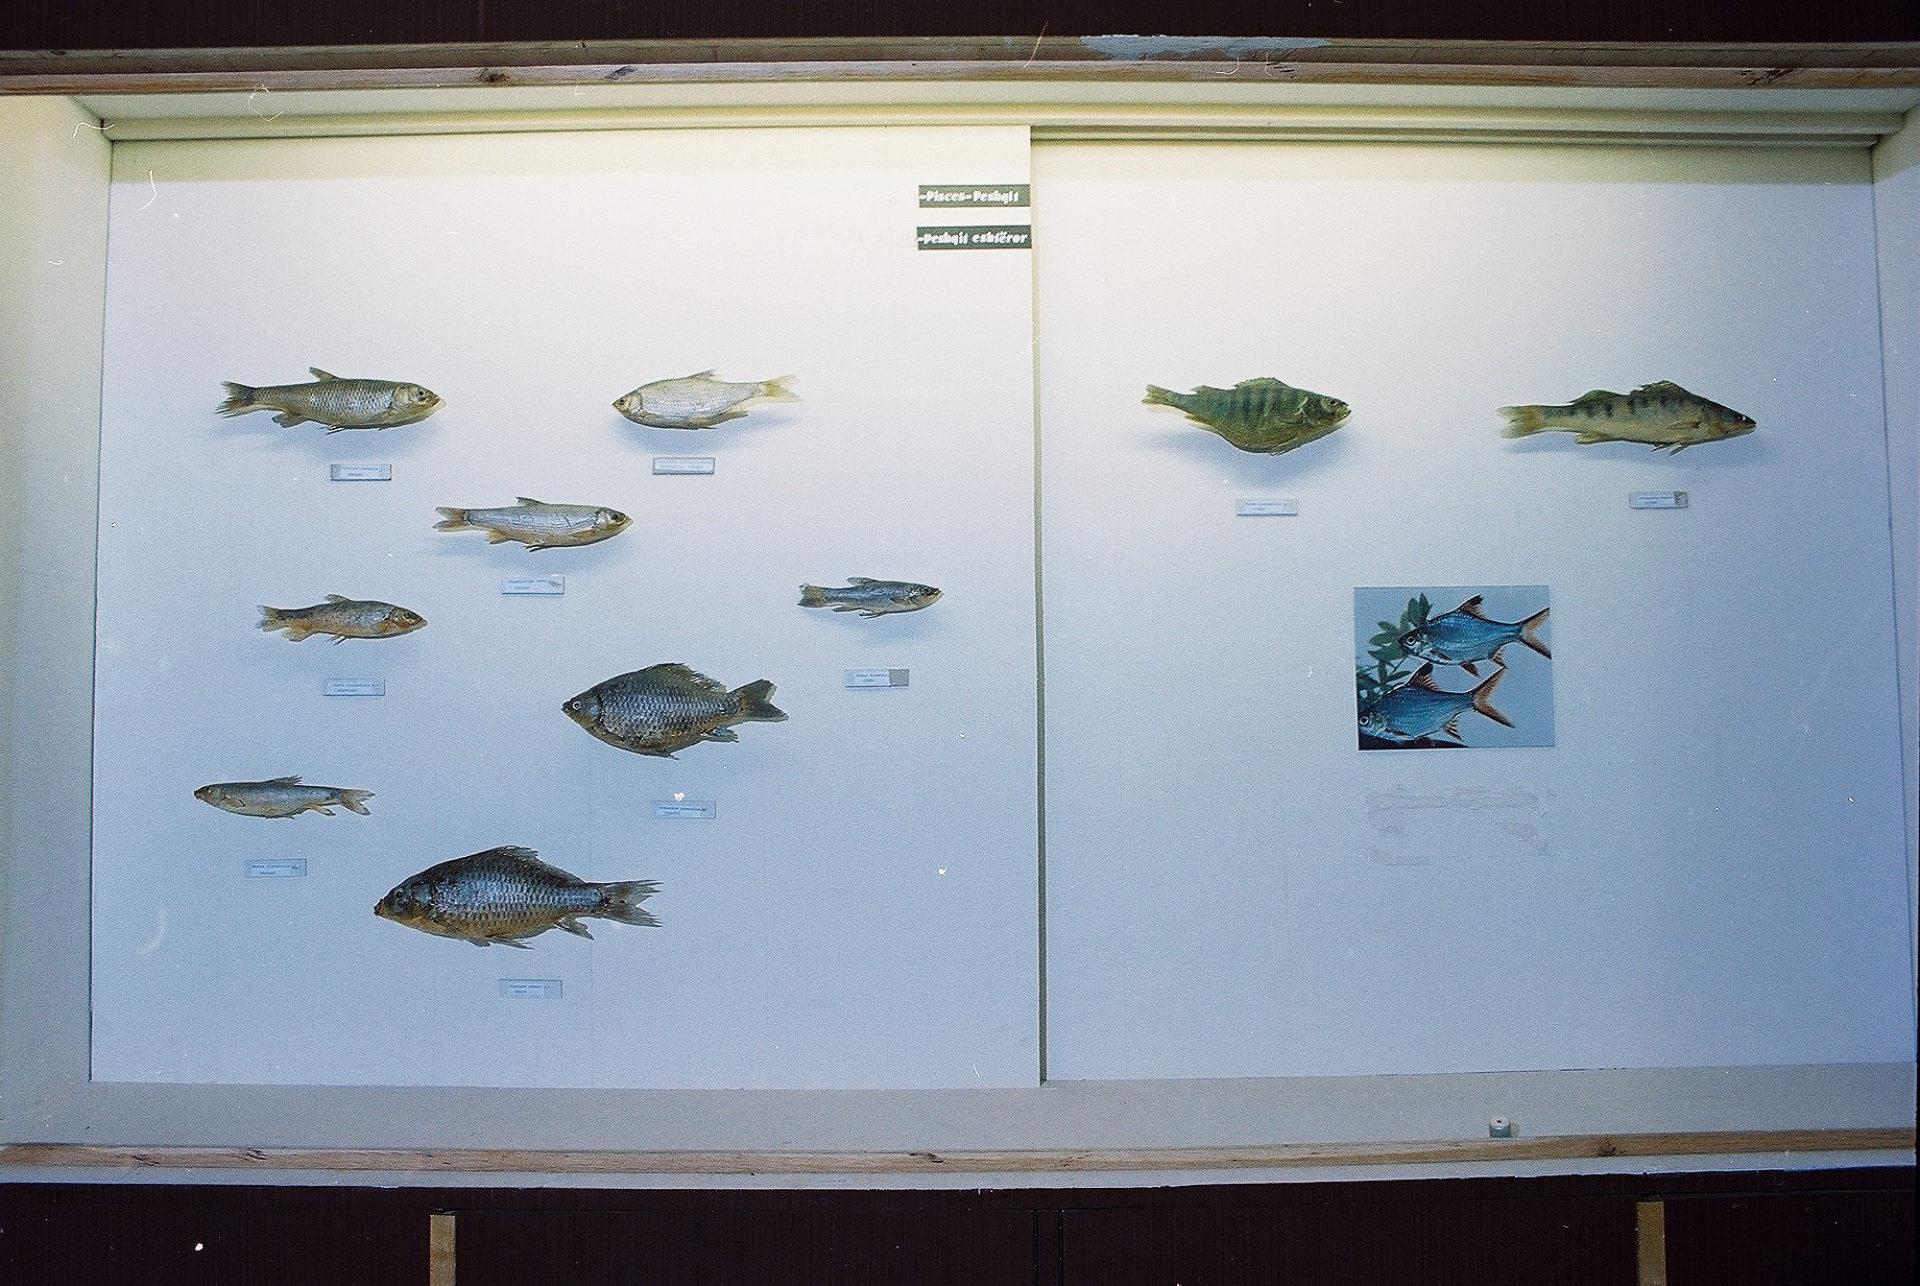 Petrit Halilaj, Special Edition (ex-Natural History Museum of Kosovo), 2013 (76/80)